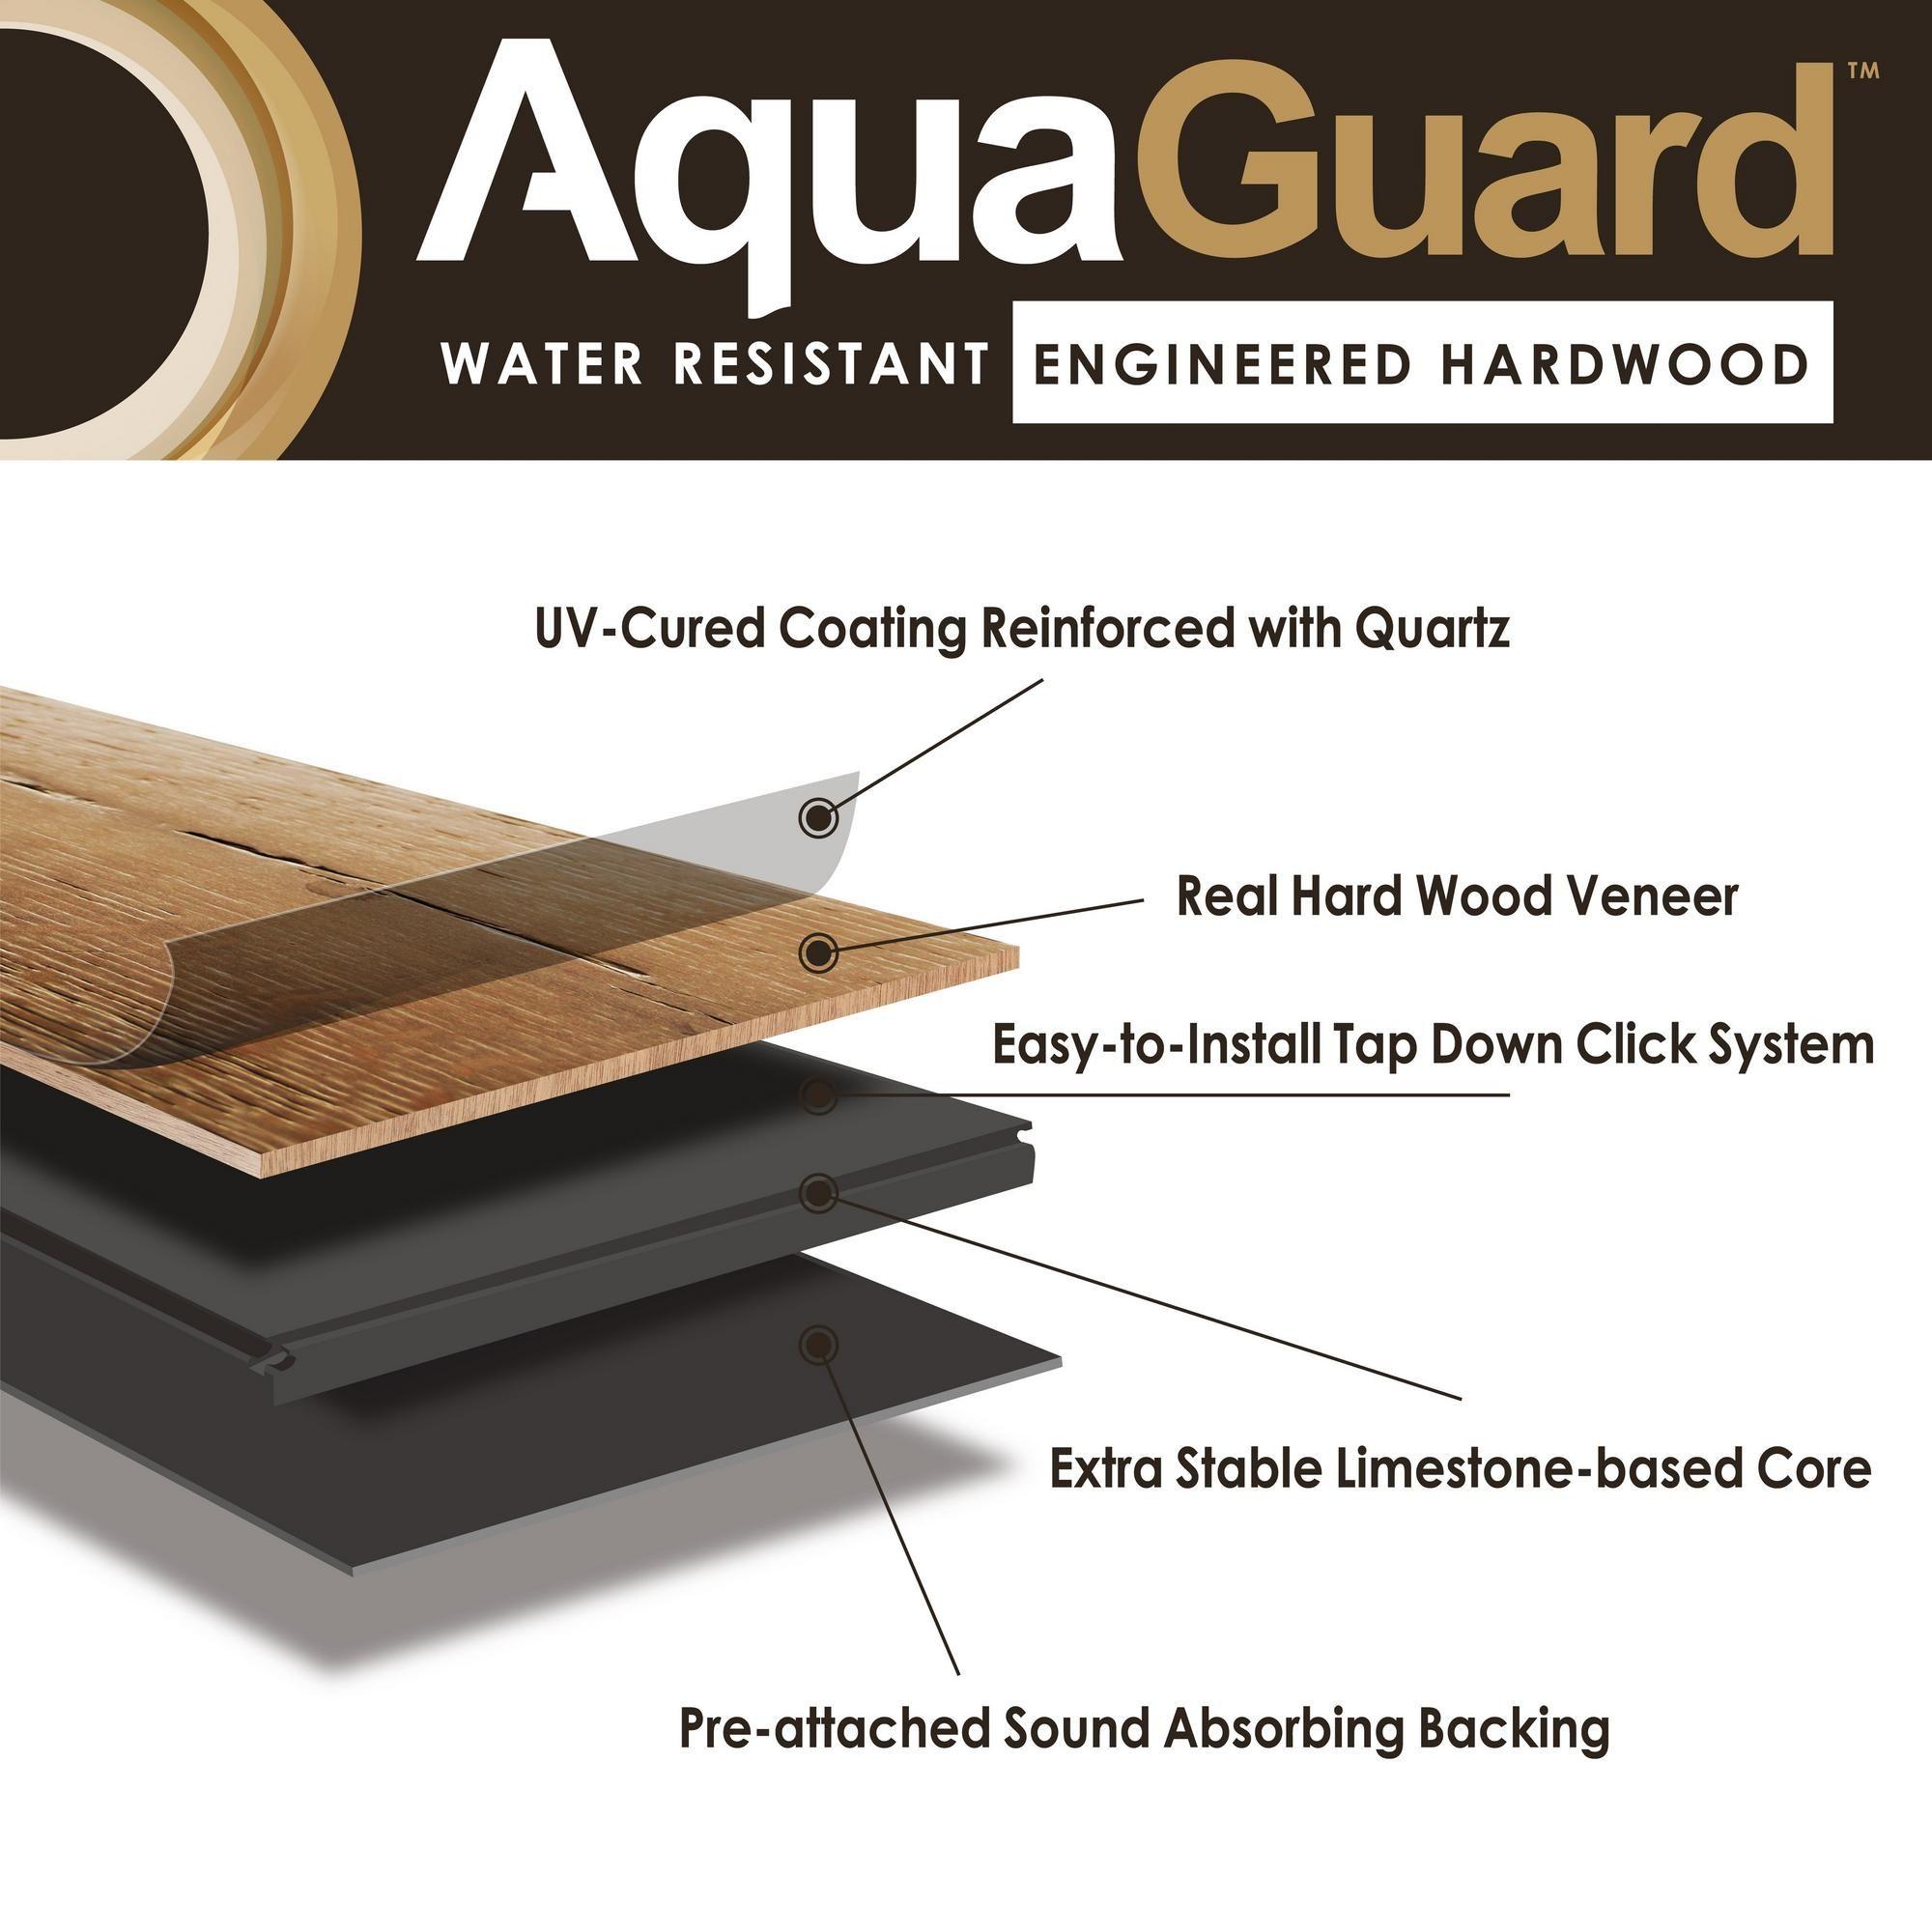 Water On Prefinished Hardwood Floors: Rich Brown Hickory Water-Resistant Engineered Hardwood